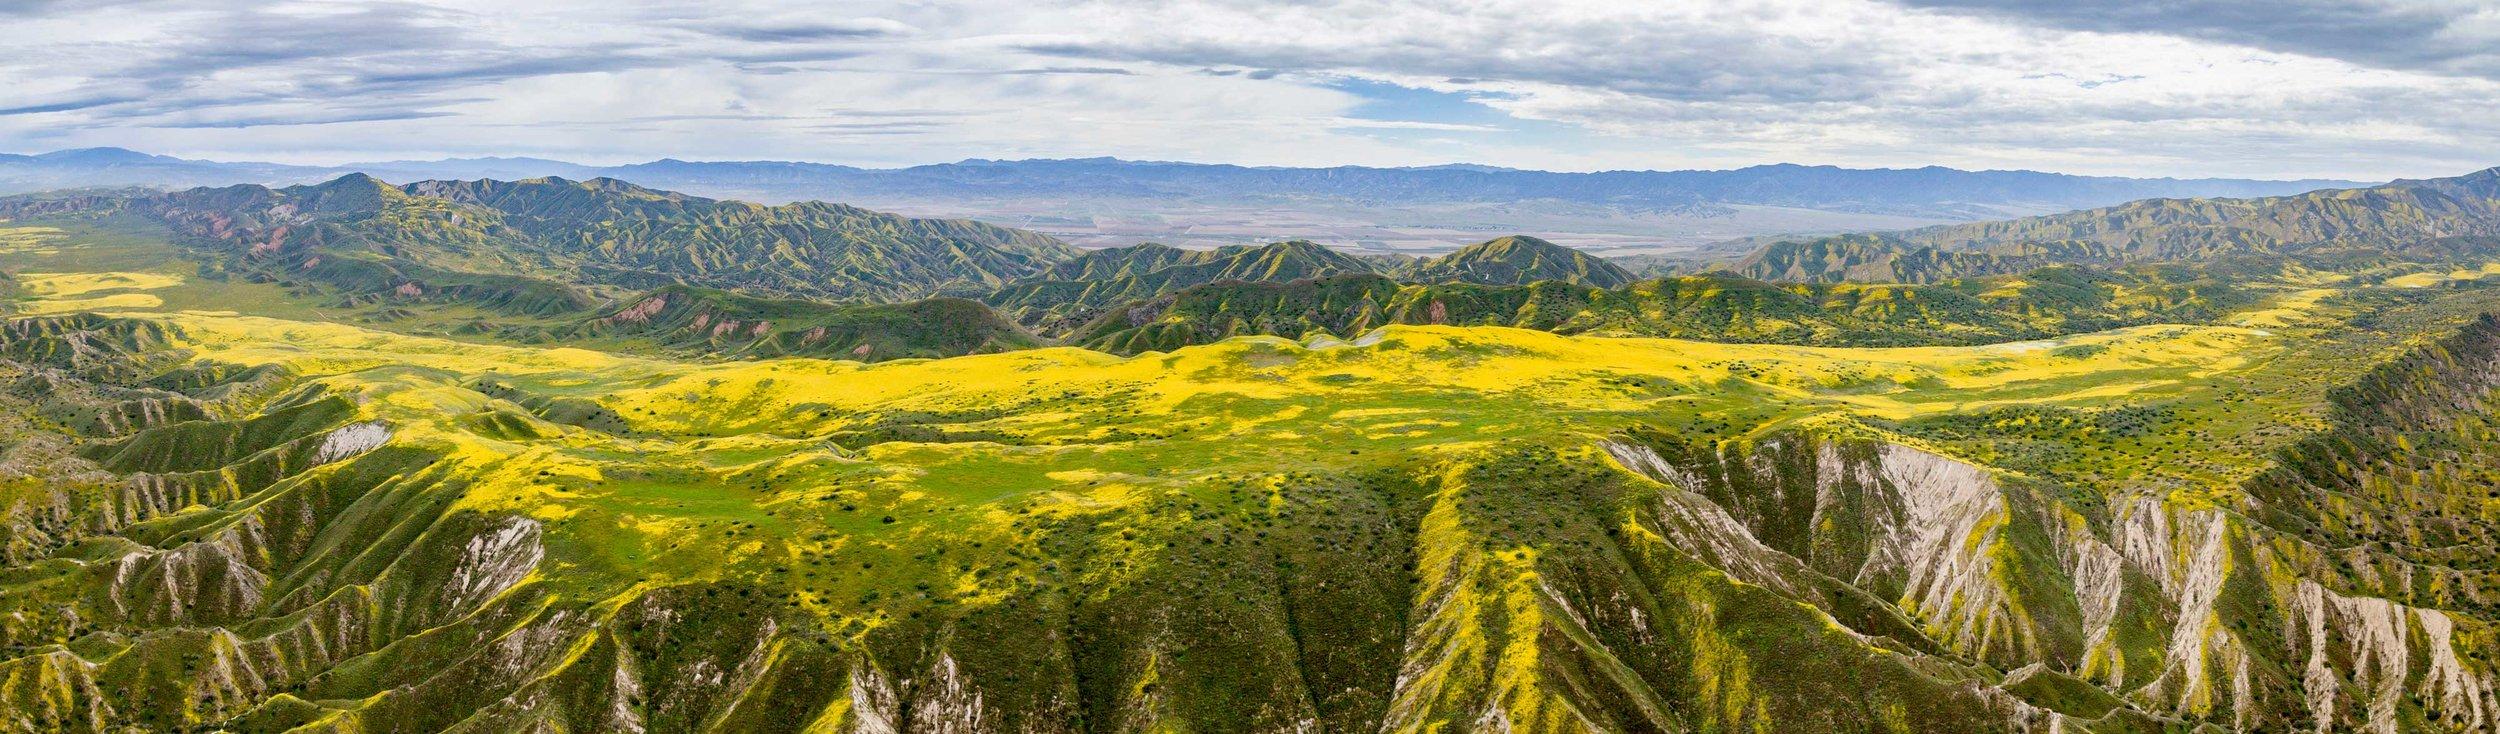 Brilliant yellow wildflowers stretch for miles on the Carrizo Plain, south of San Luis Obispo, CA.